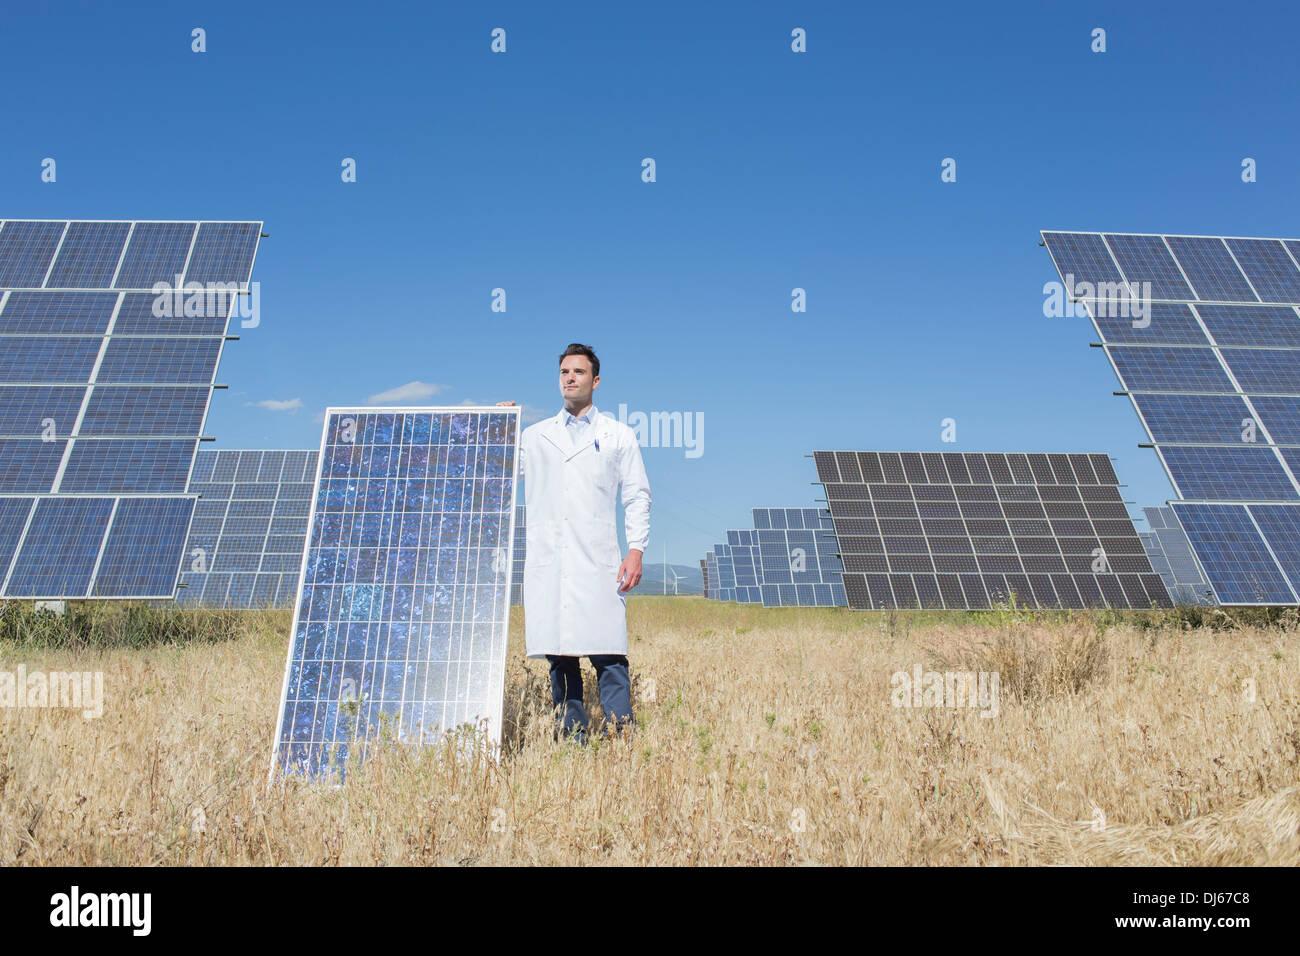 Scientist holding solar panel in rural landscape - Stock Image